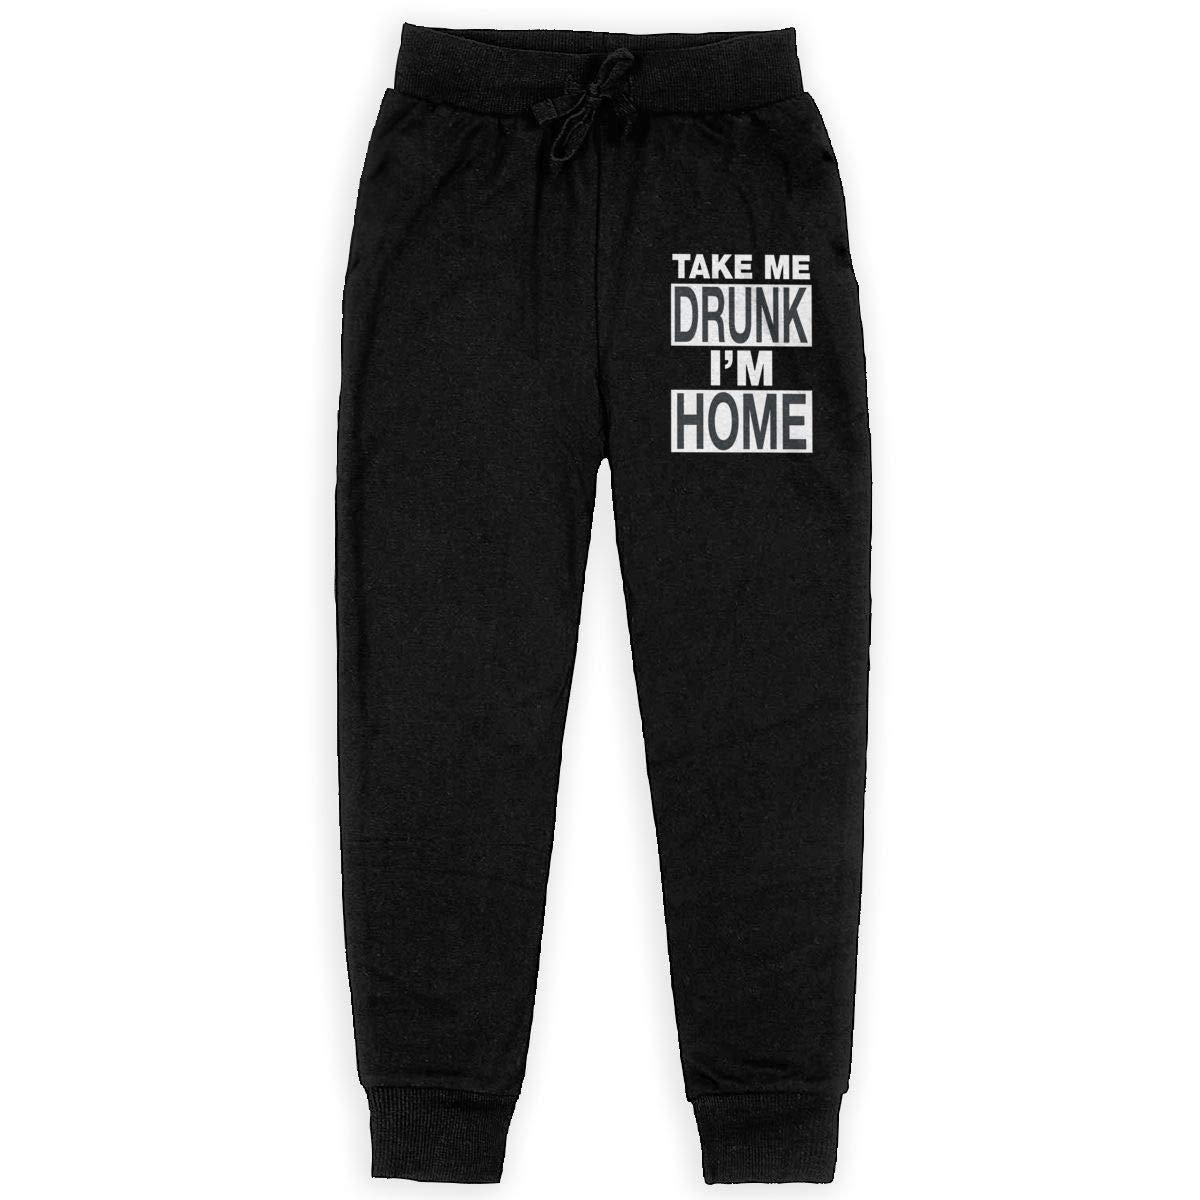 Dunpaiaa Take Me Drunk Im Home Boys Sweatpants,Joggers Sport Training Pants Trousers Black